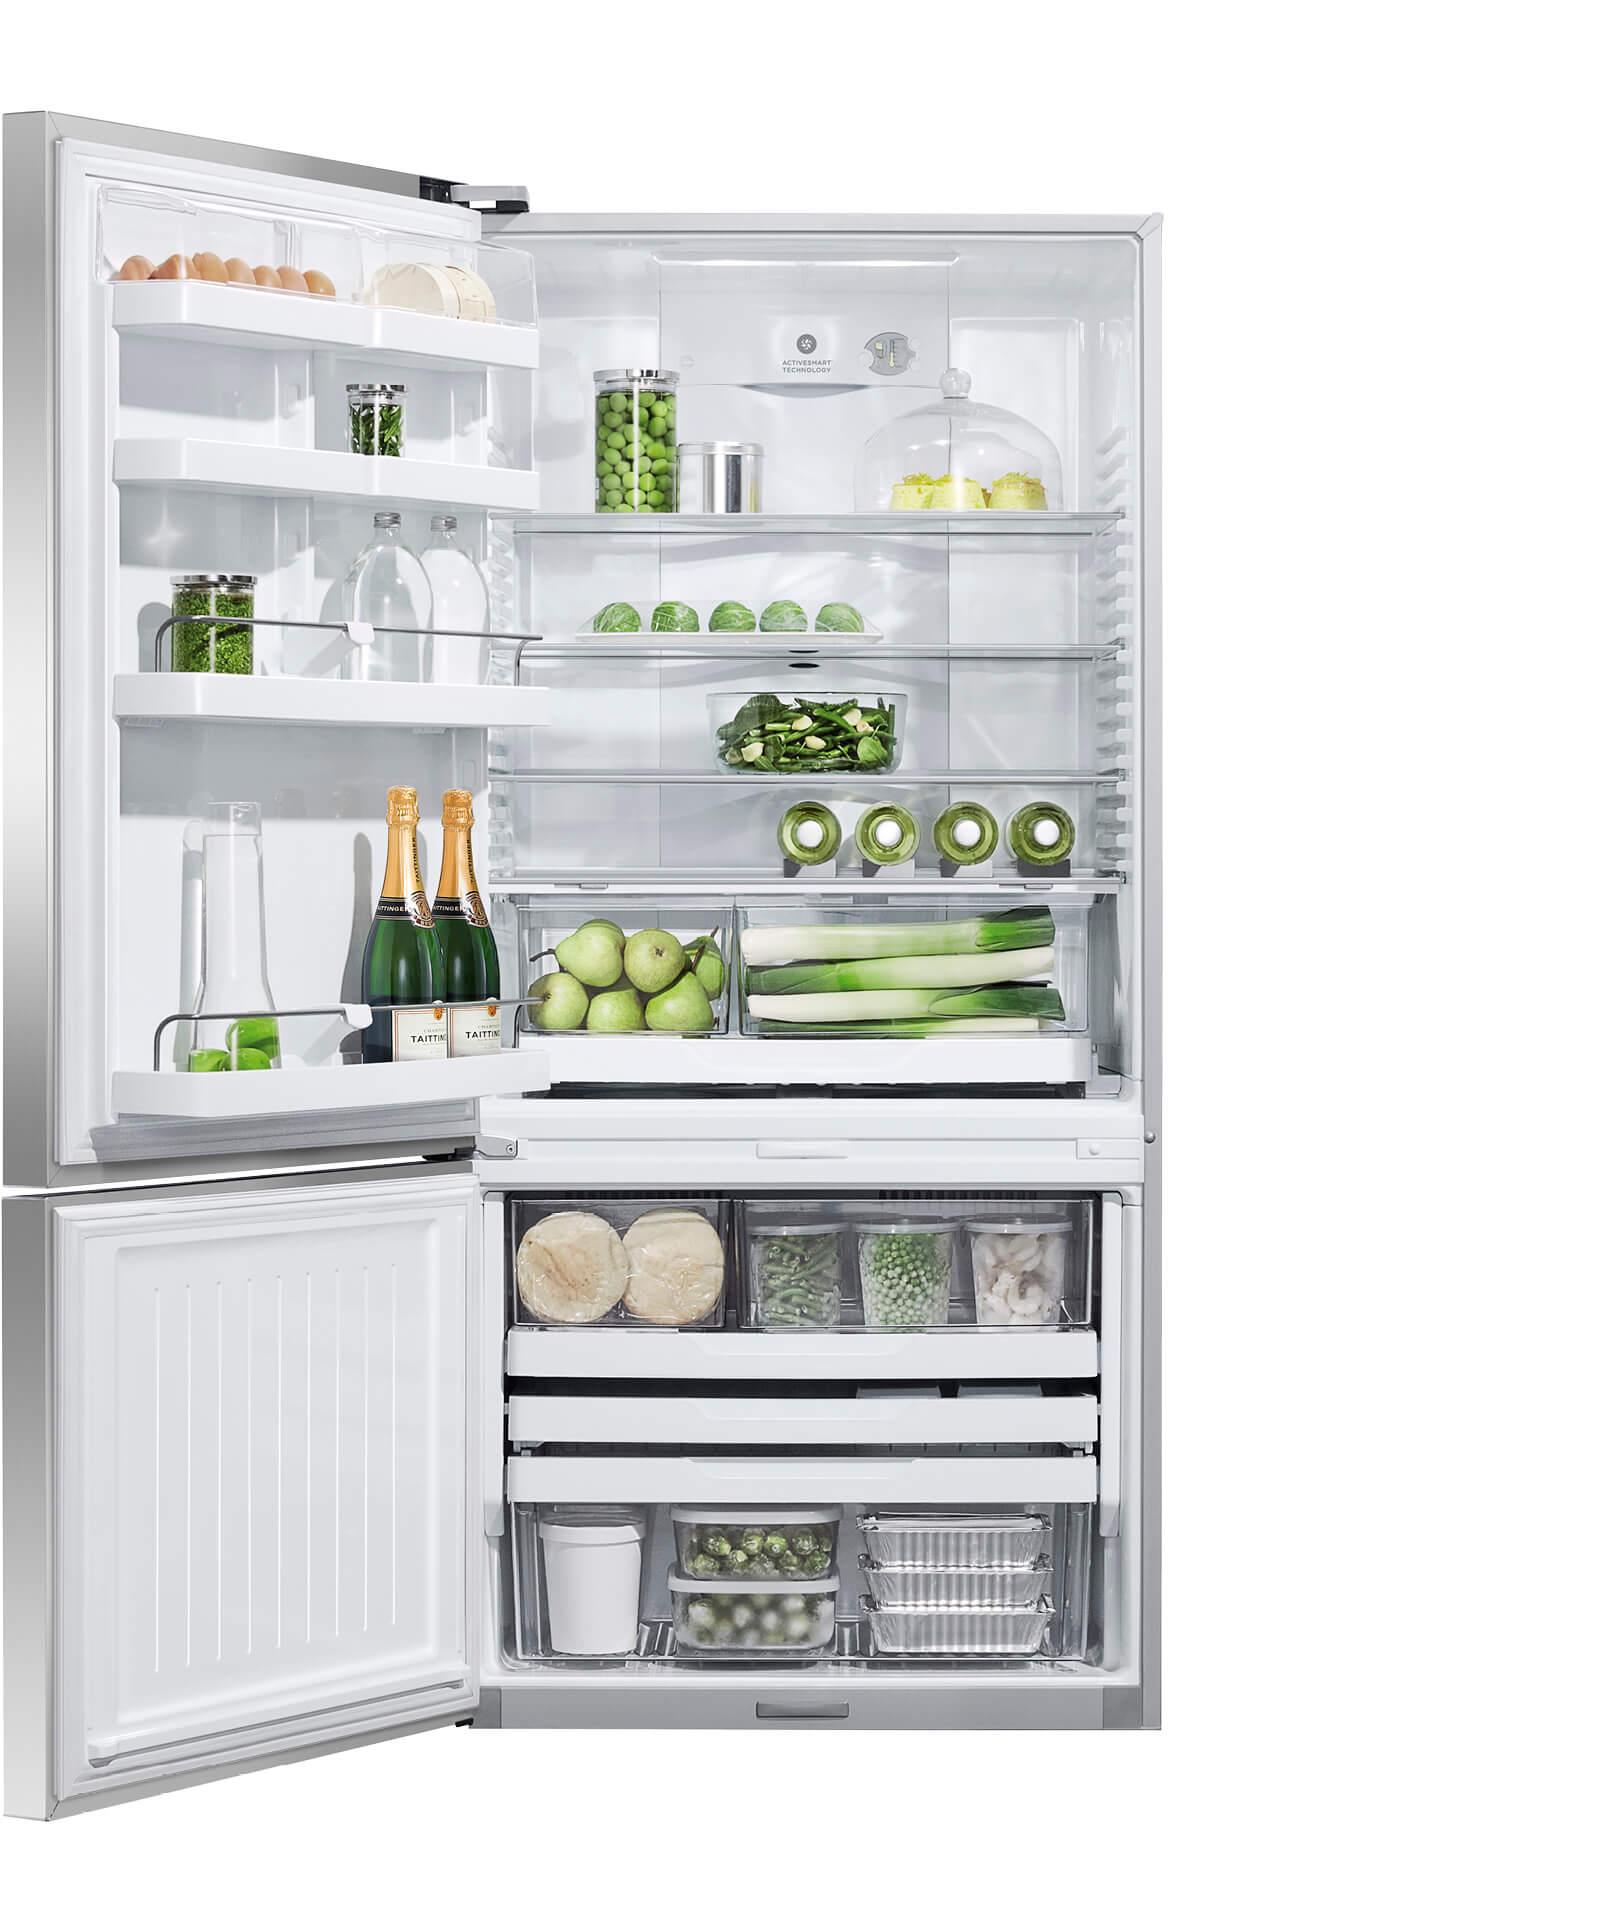 E522blxfd5 Activesmart Fridge Bottom Freezer 519l